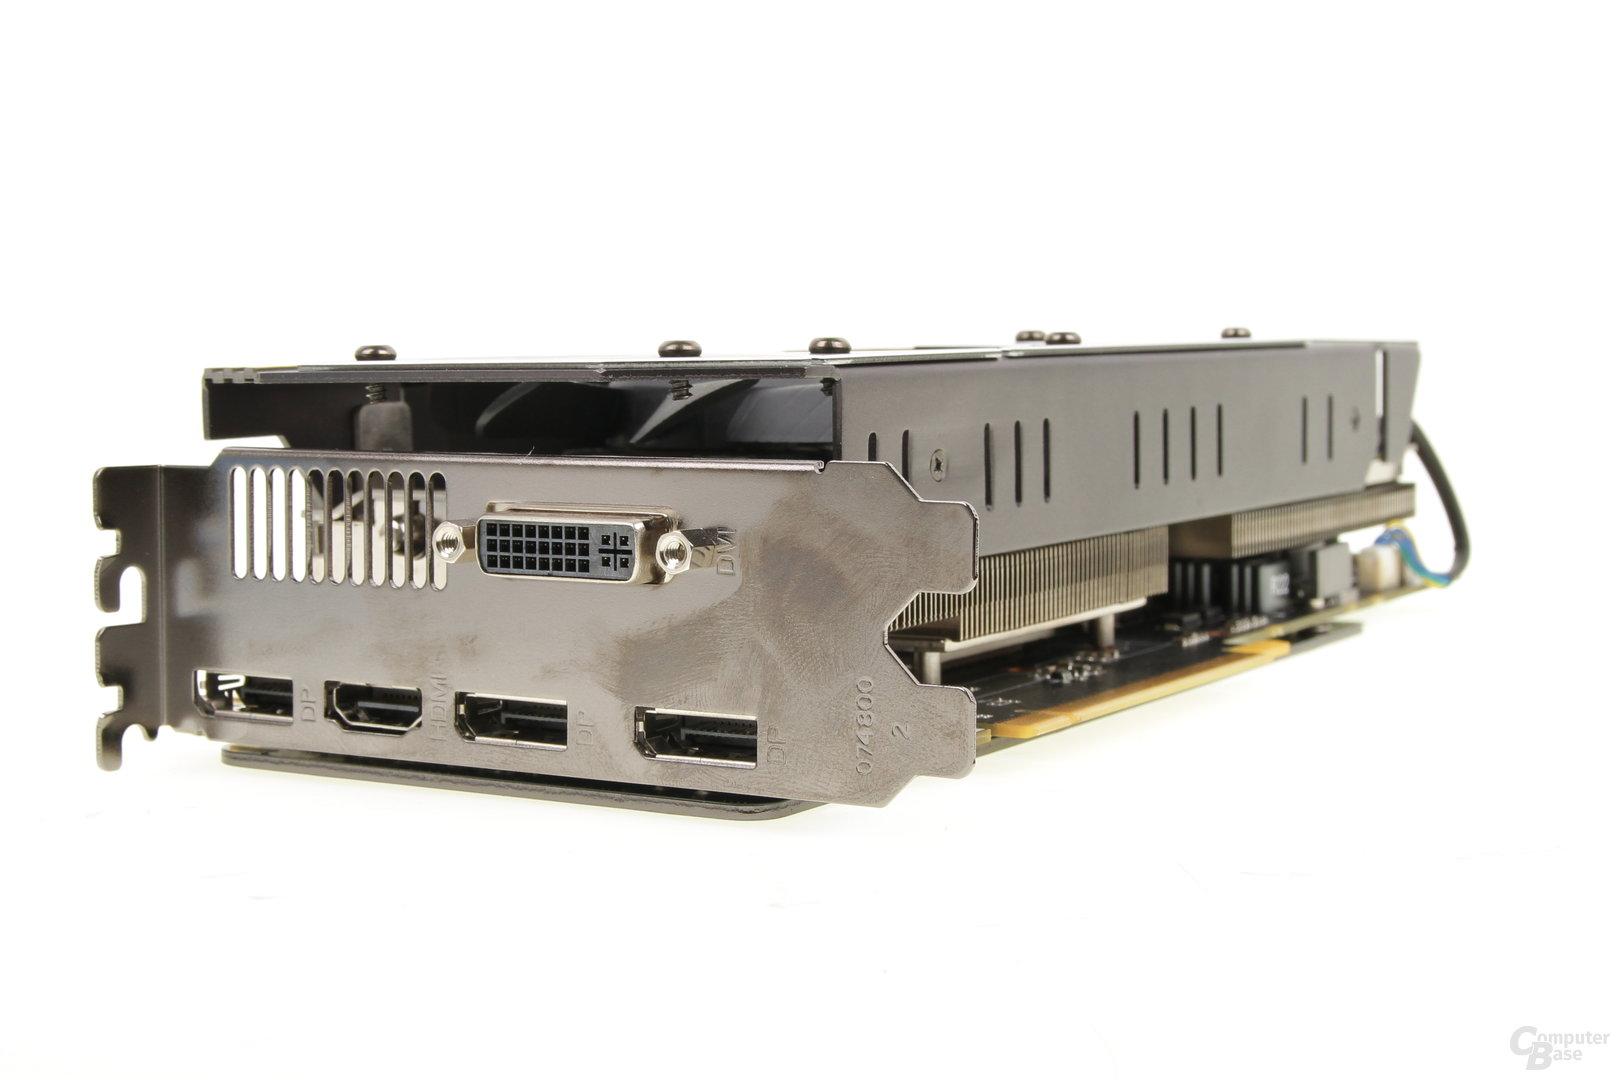 Zotac GeForce GTX 970 Omega – Anschlüsse